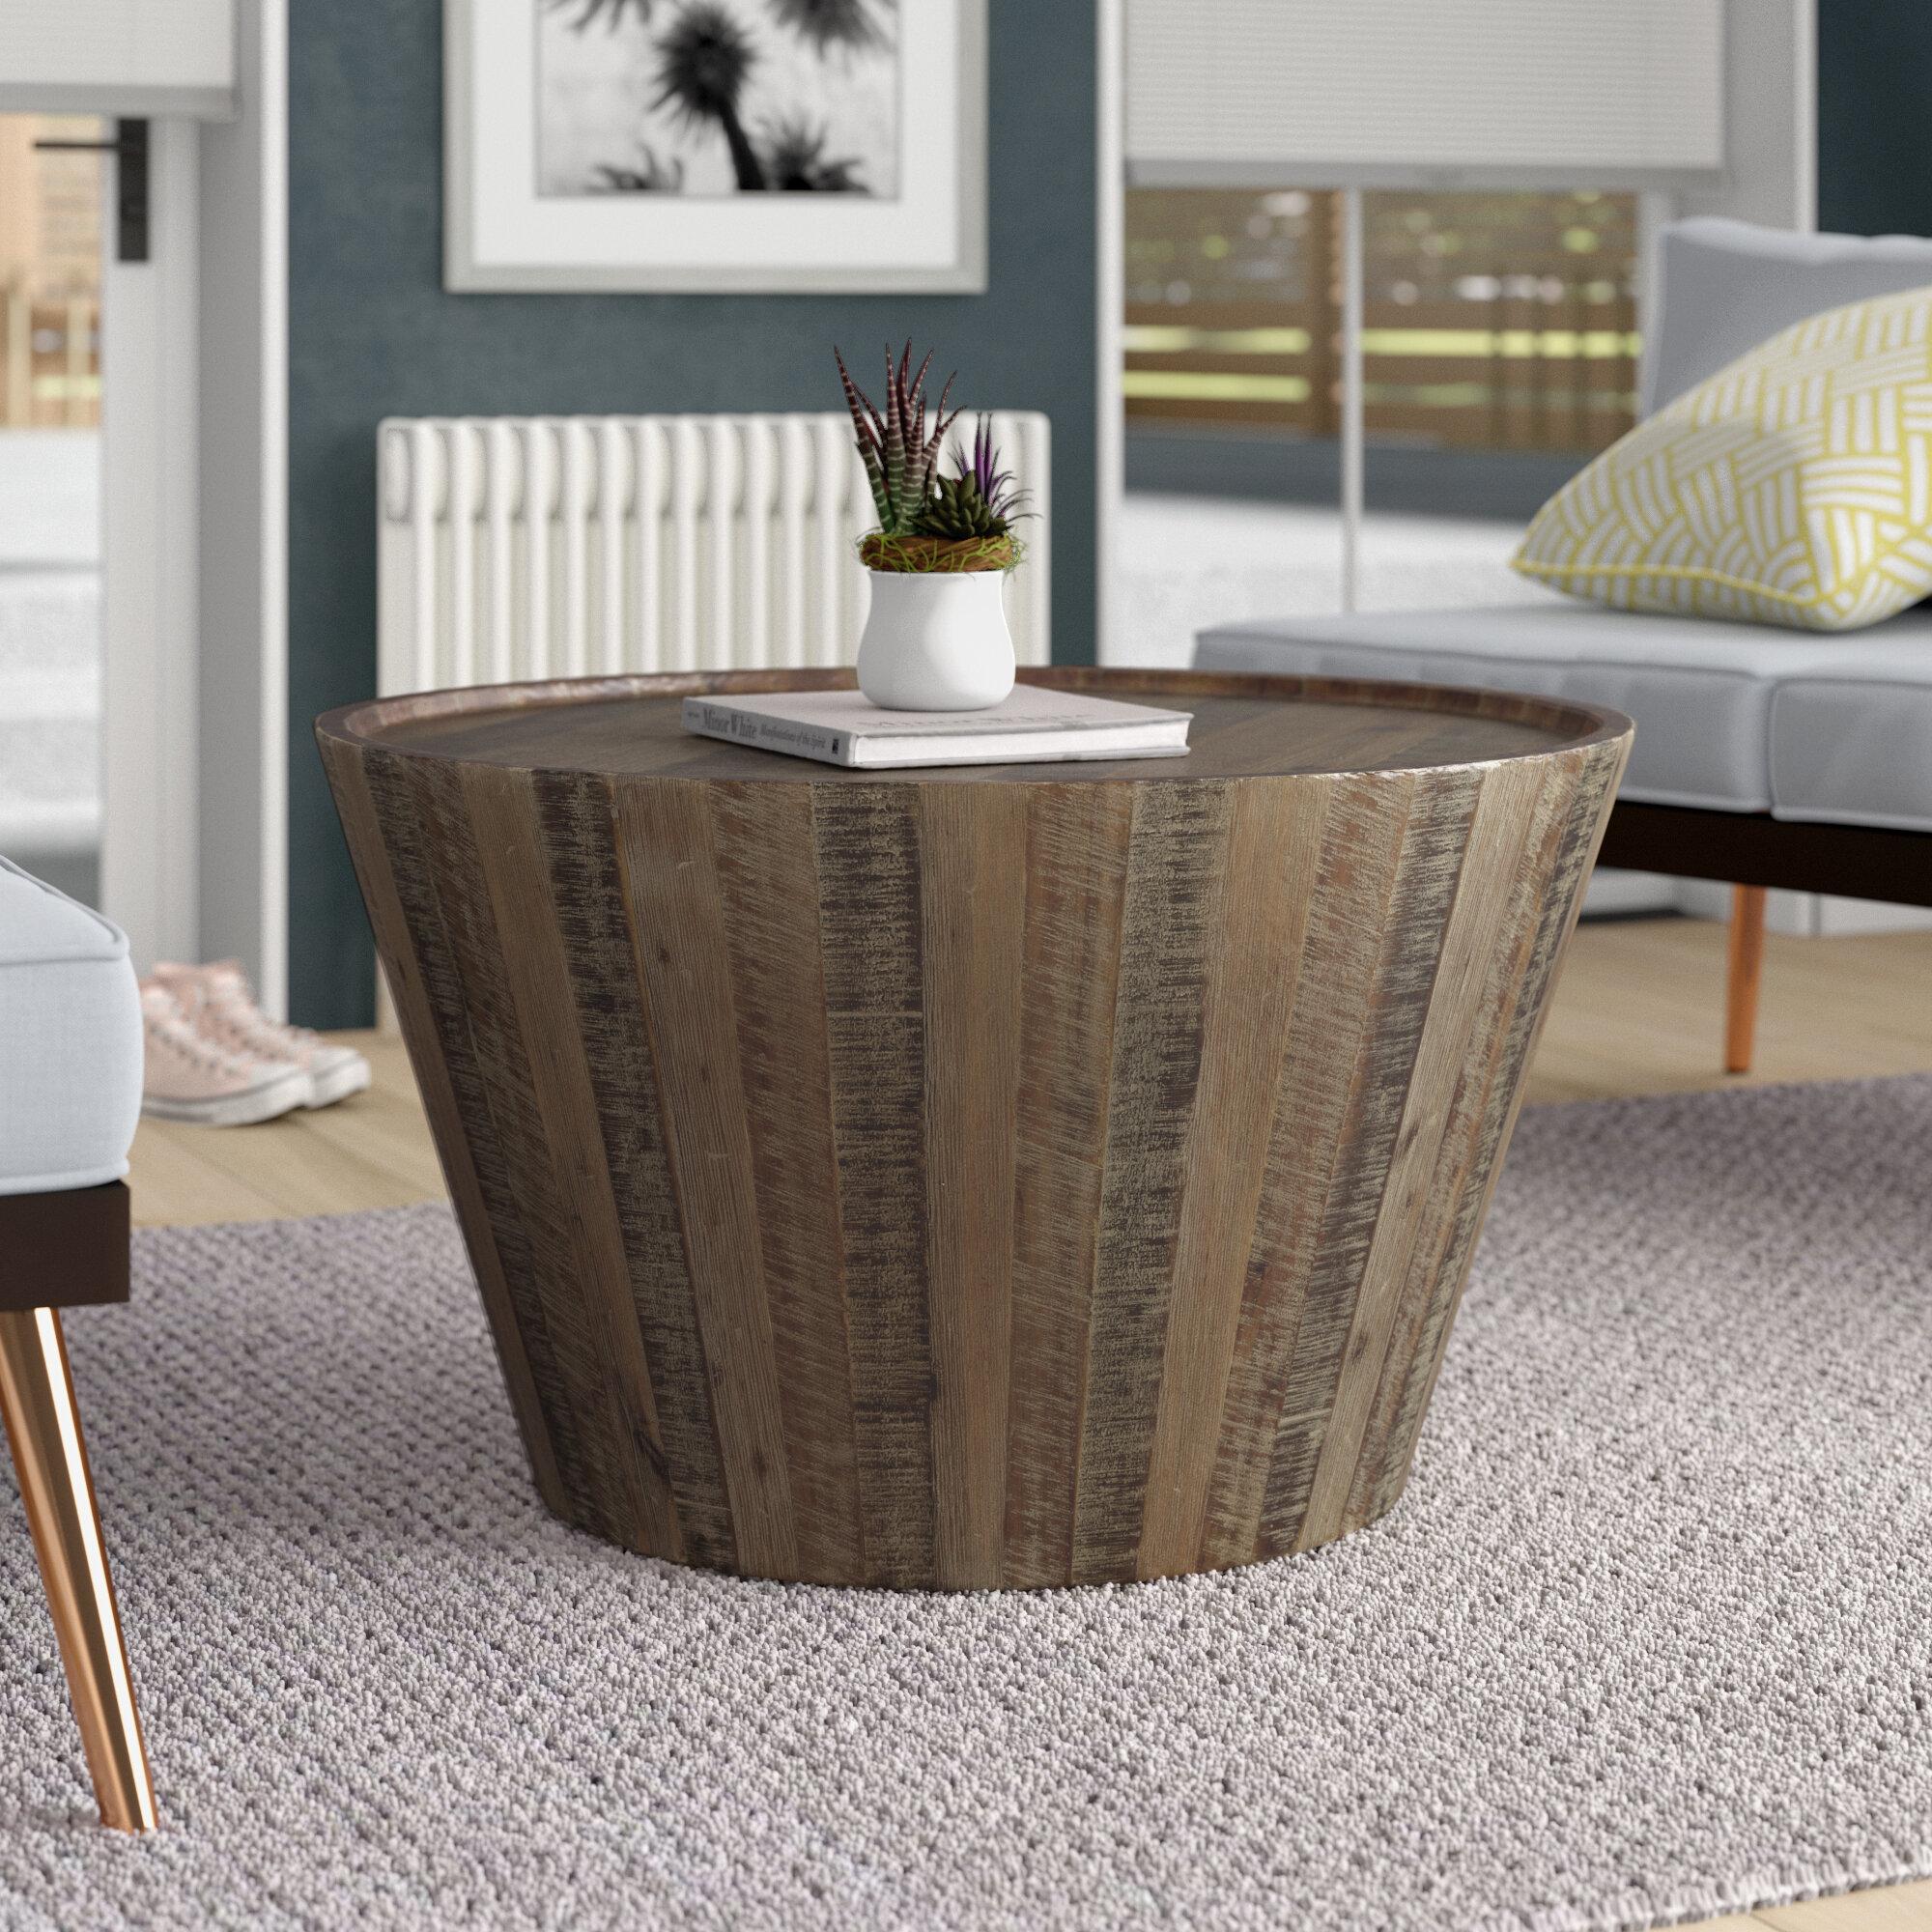 Brayden Studio Limones Solid Wood Drum Coffee Table Reviews Wayfair